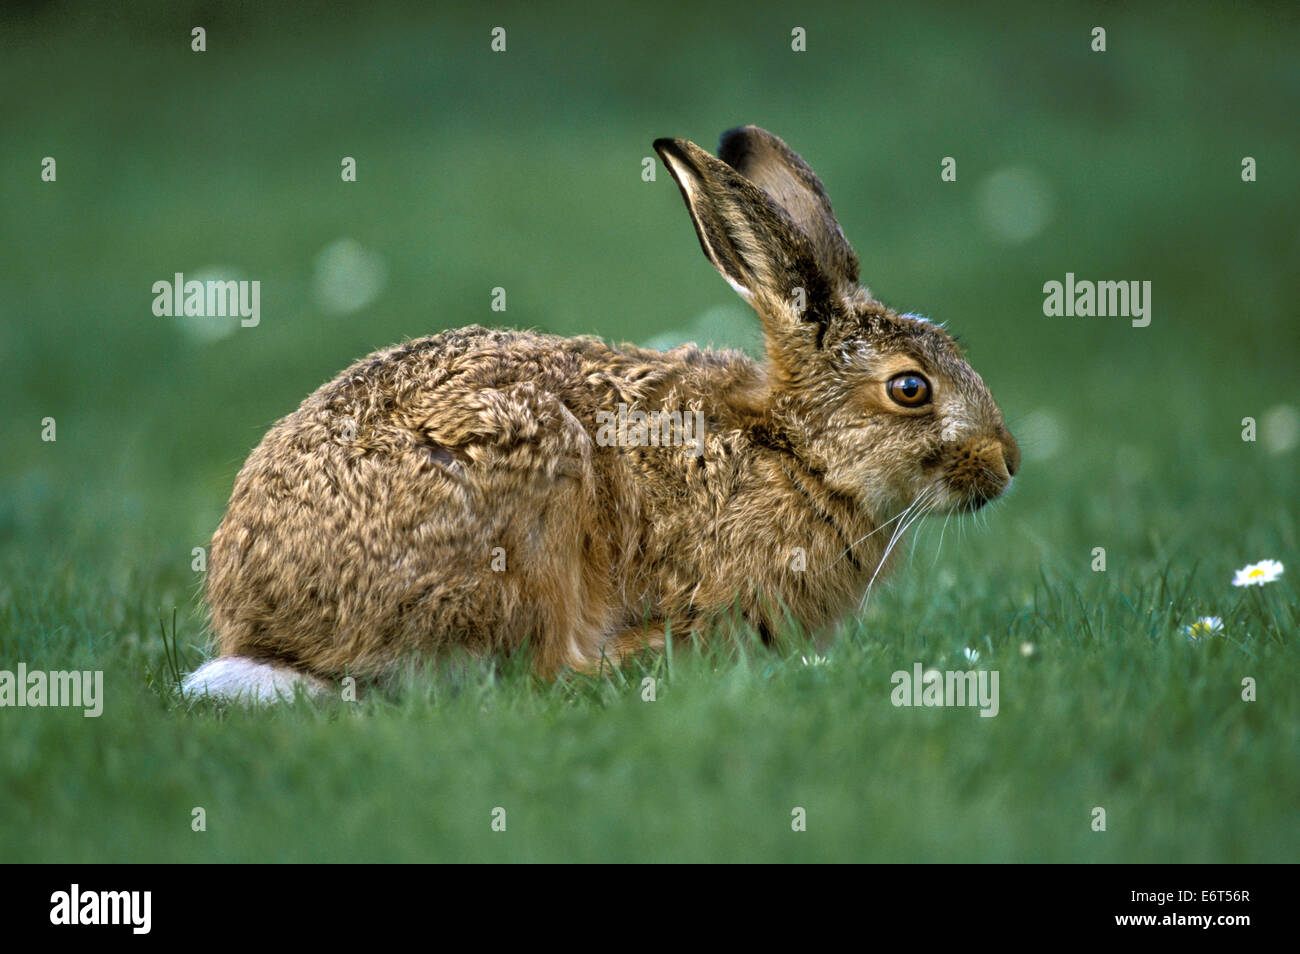 Brown Hare - Lepus europaeus - Stock Image